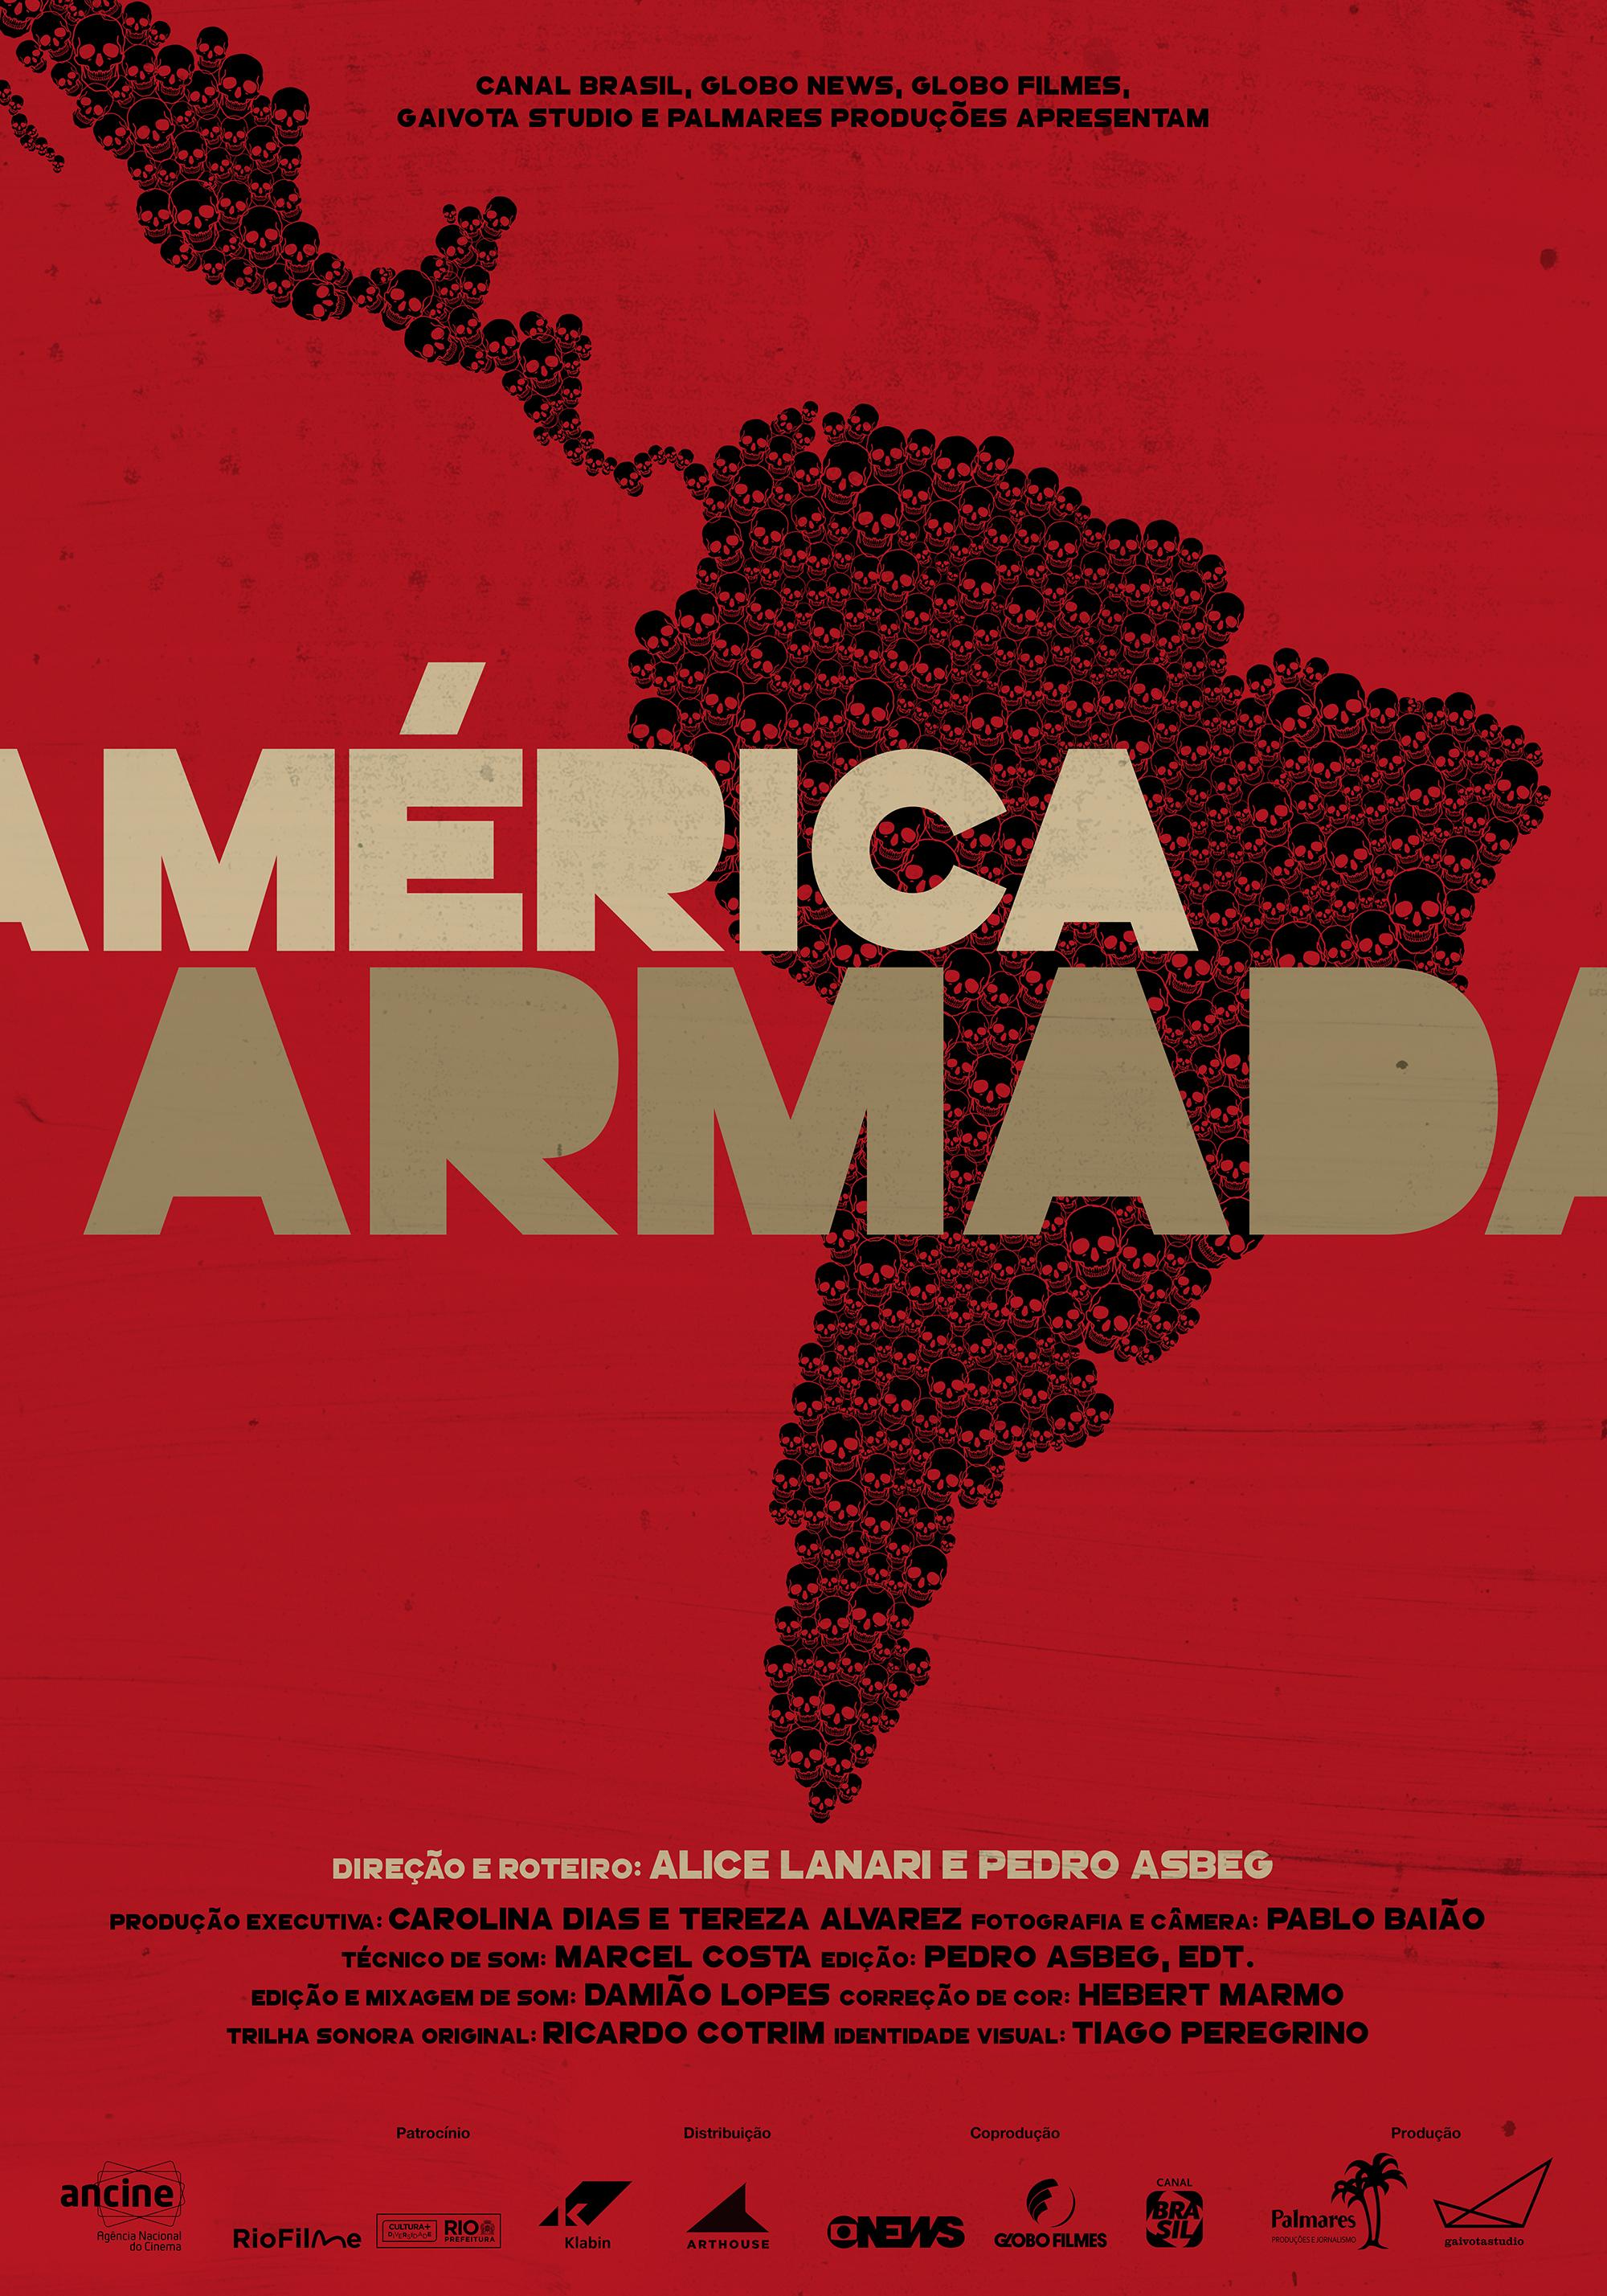 AmericaArmada_poster_ok - Pedro Asbeg.jpg